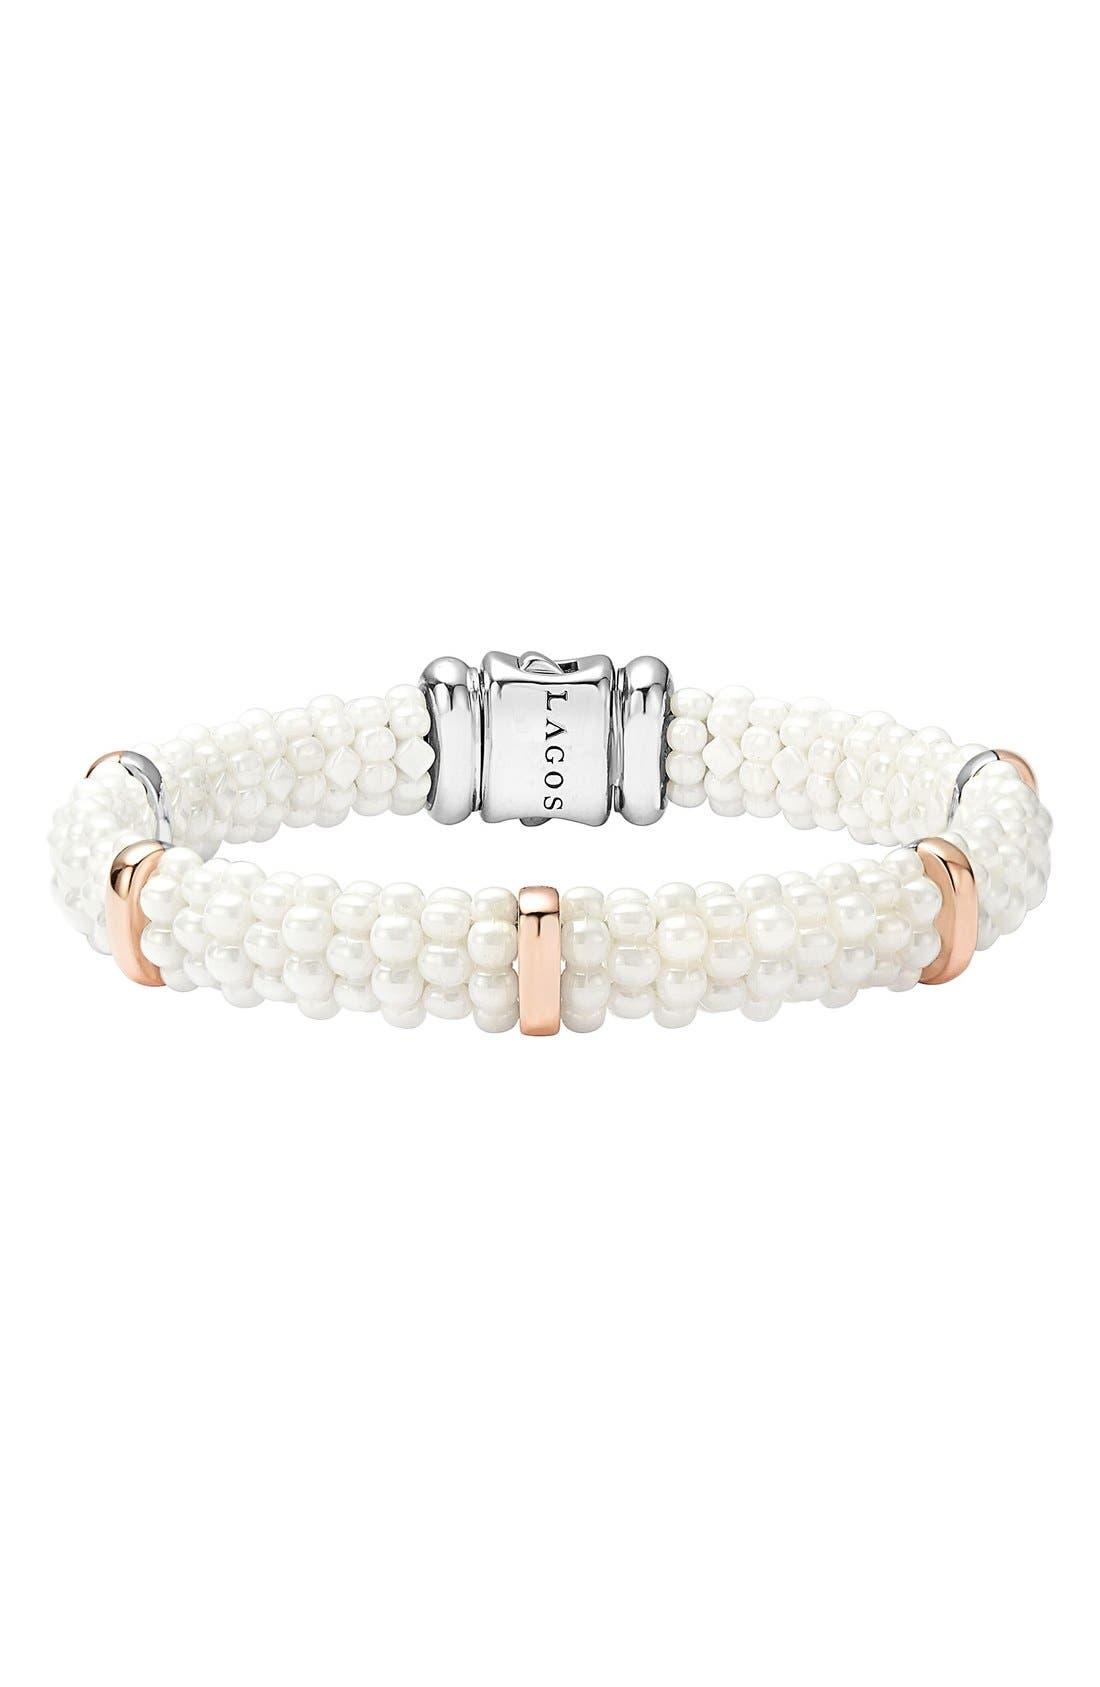 'White Caviar' Five Station Bracelet,                             Main thumbnail 1, color,                             100